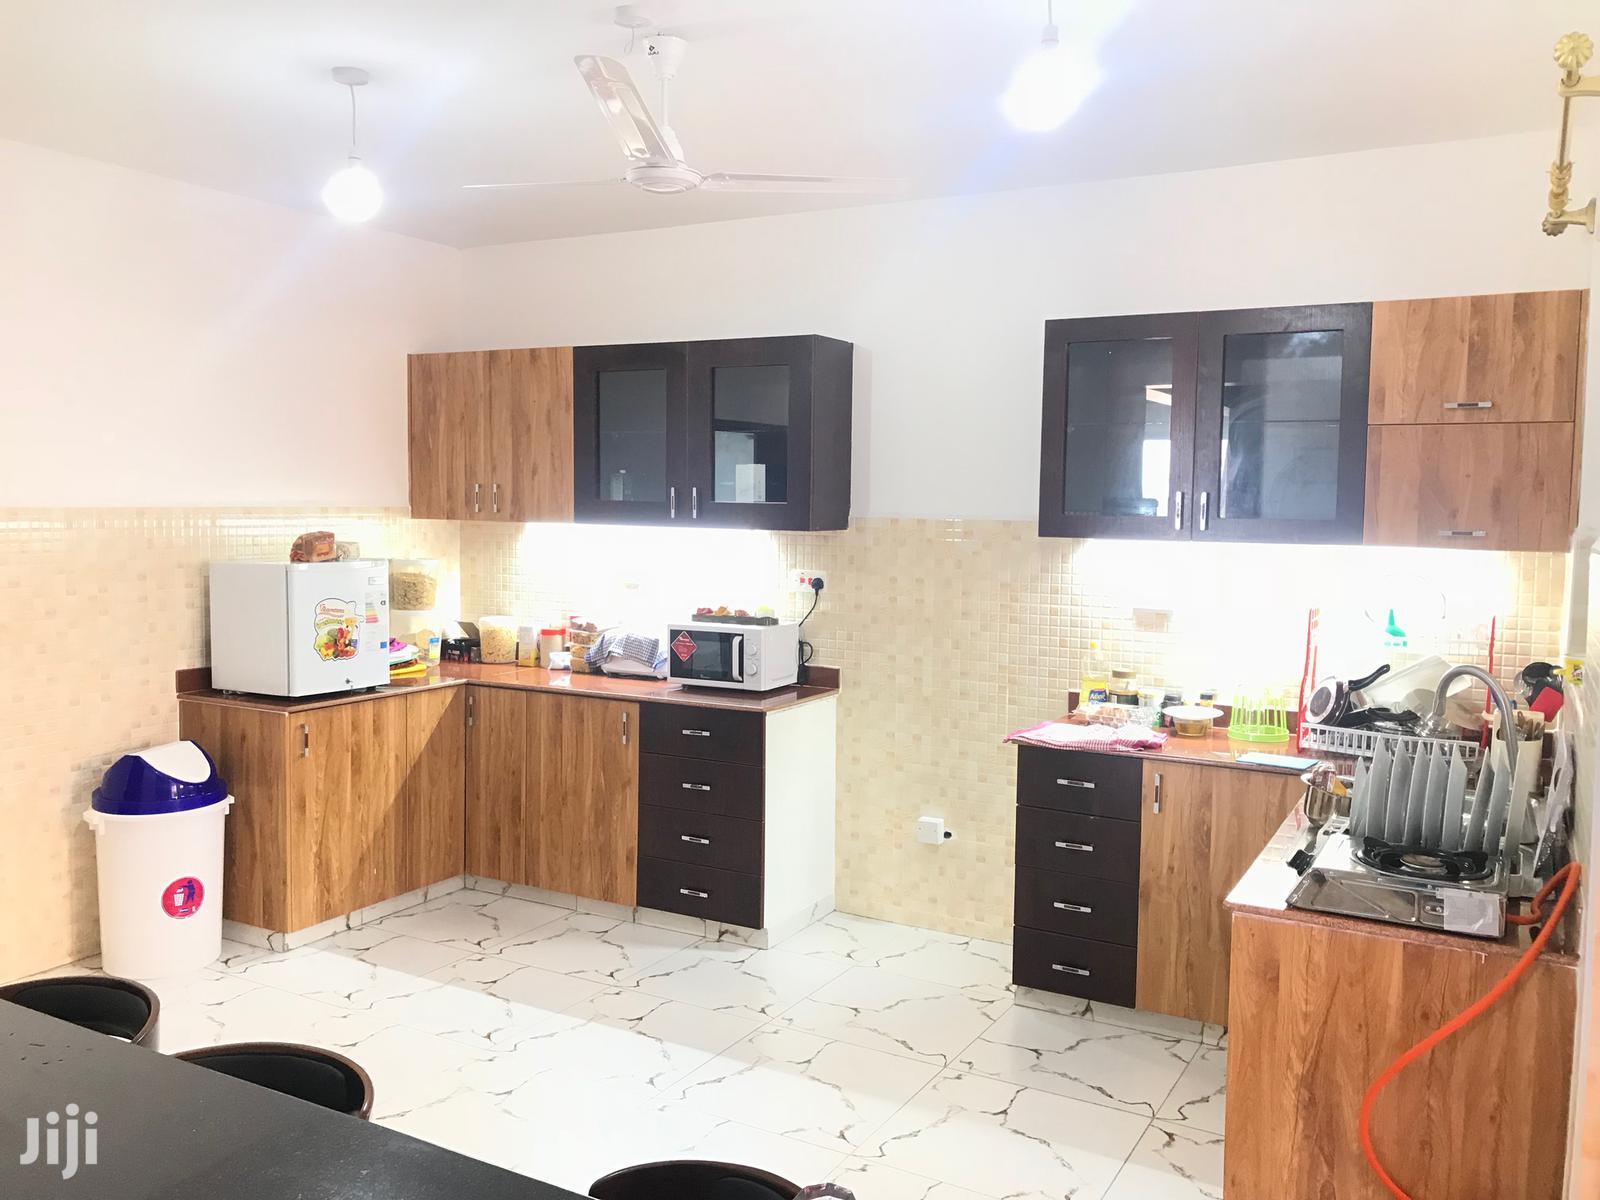 Luxurious Apartment for Sale - 3 Bedroom- Sea View - Nyali   Houses & Apartments For Sale for sale in Nyali, Mombasa, Kenya